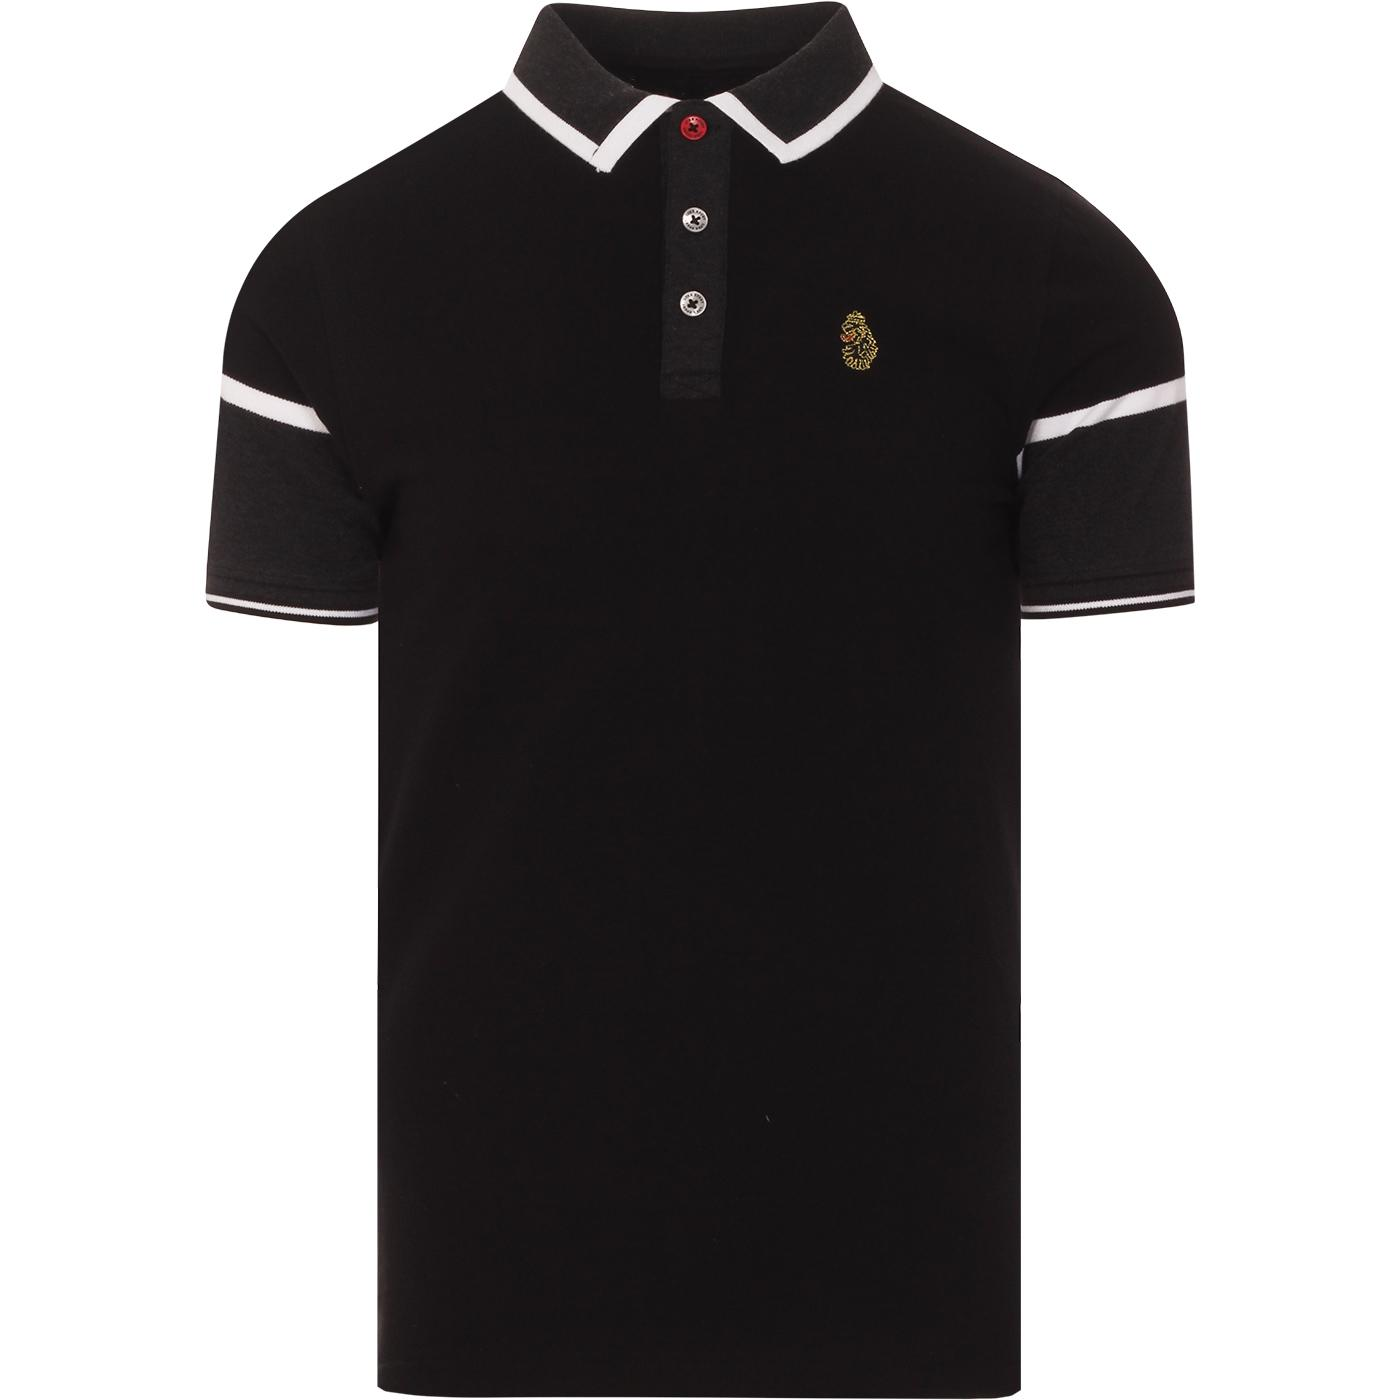 Boyo LUKE Retro Mod Tipped Pique Polo Shirt (JB)